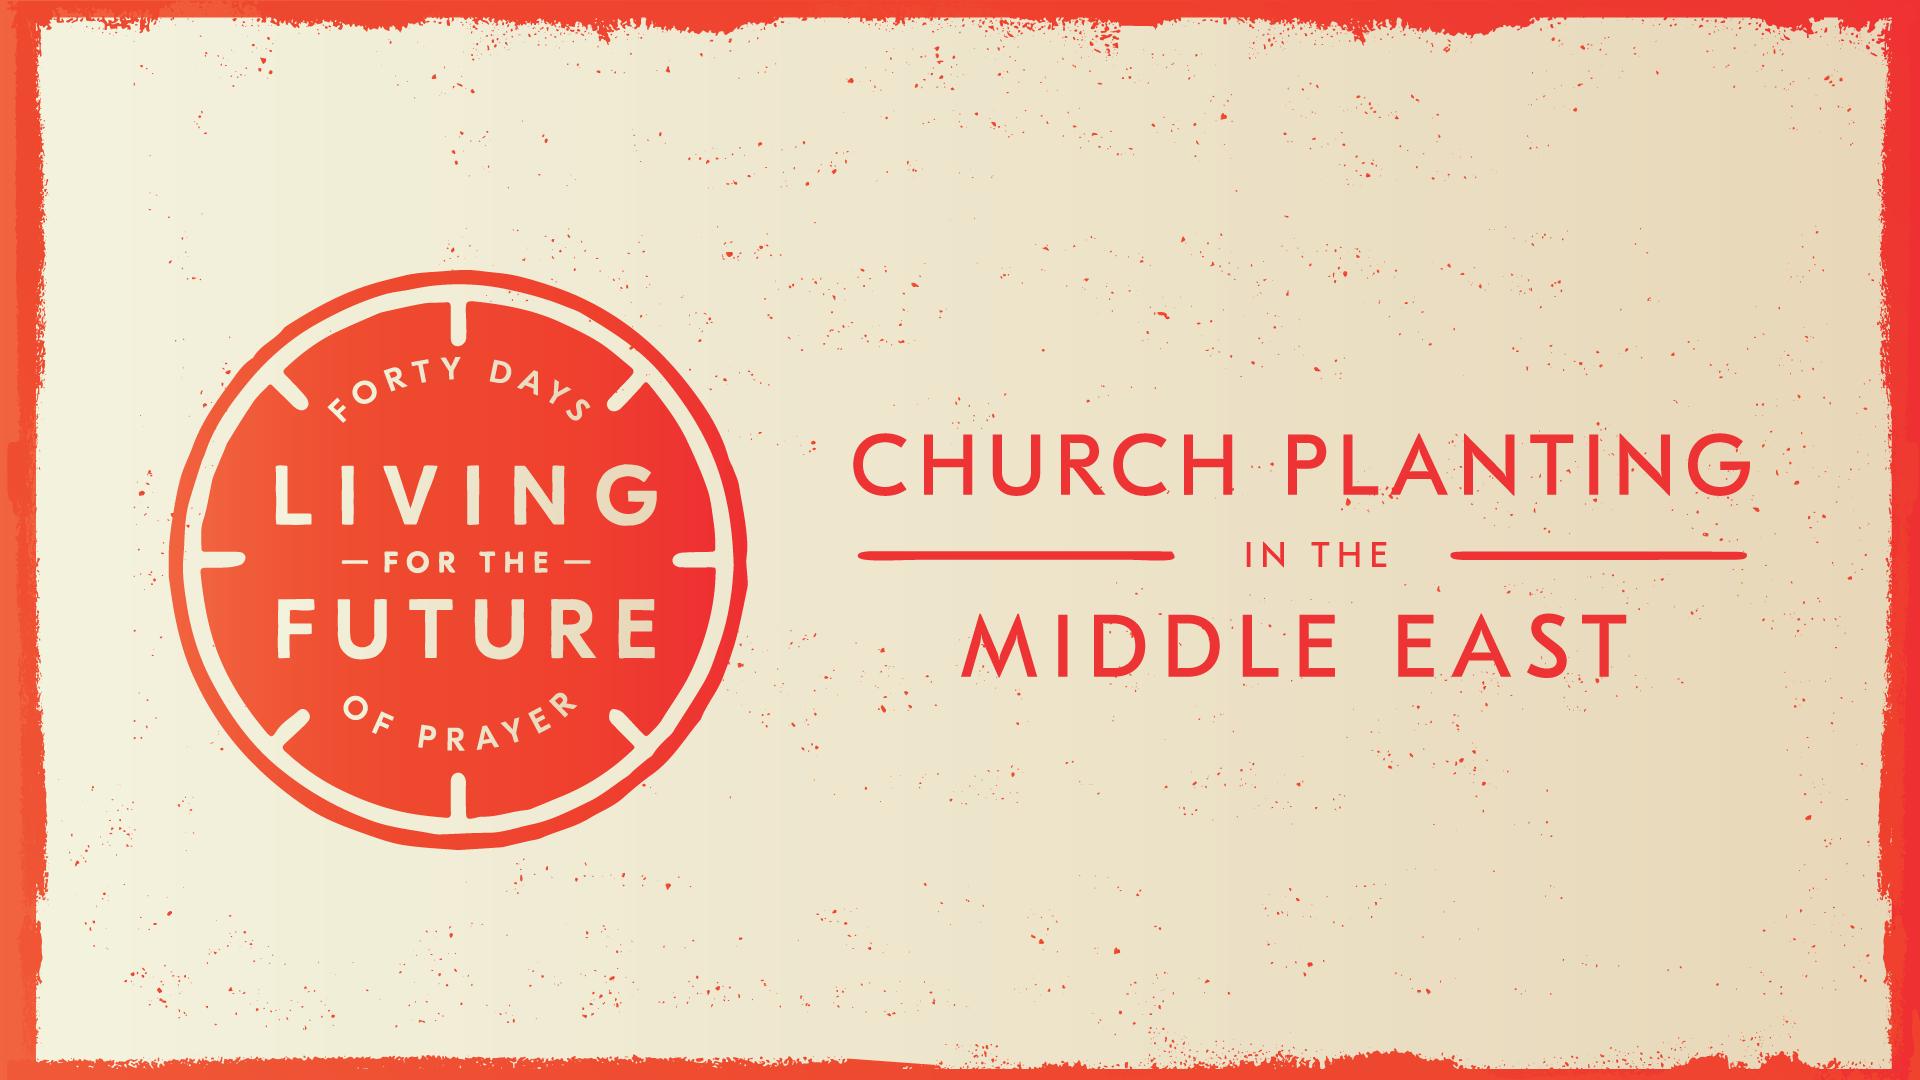 churchplantingblog.png